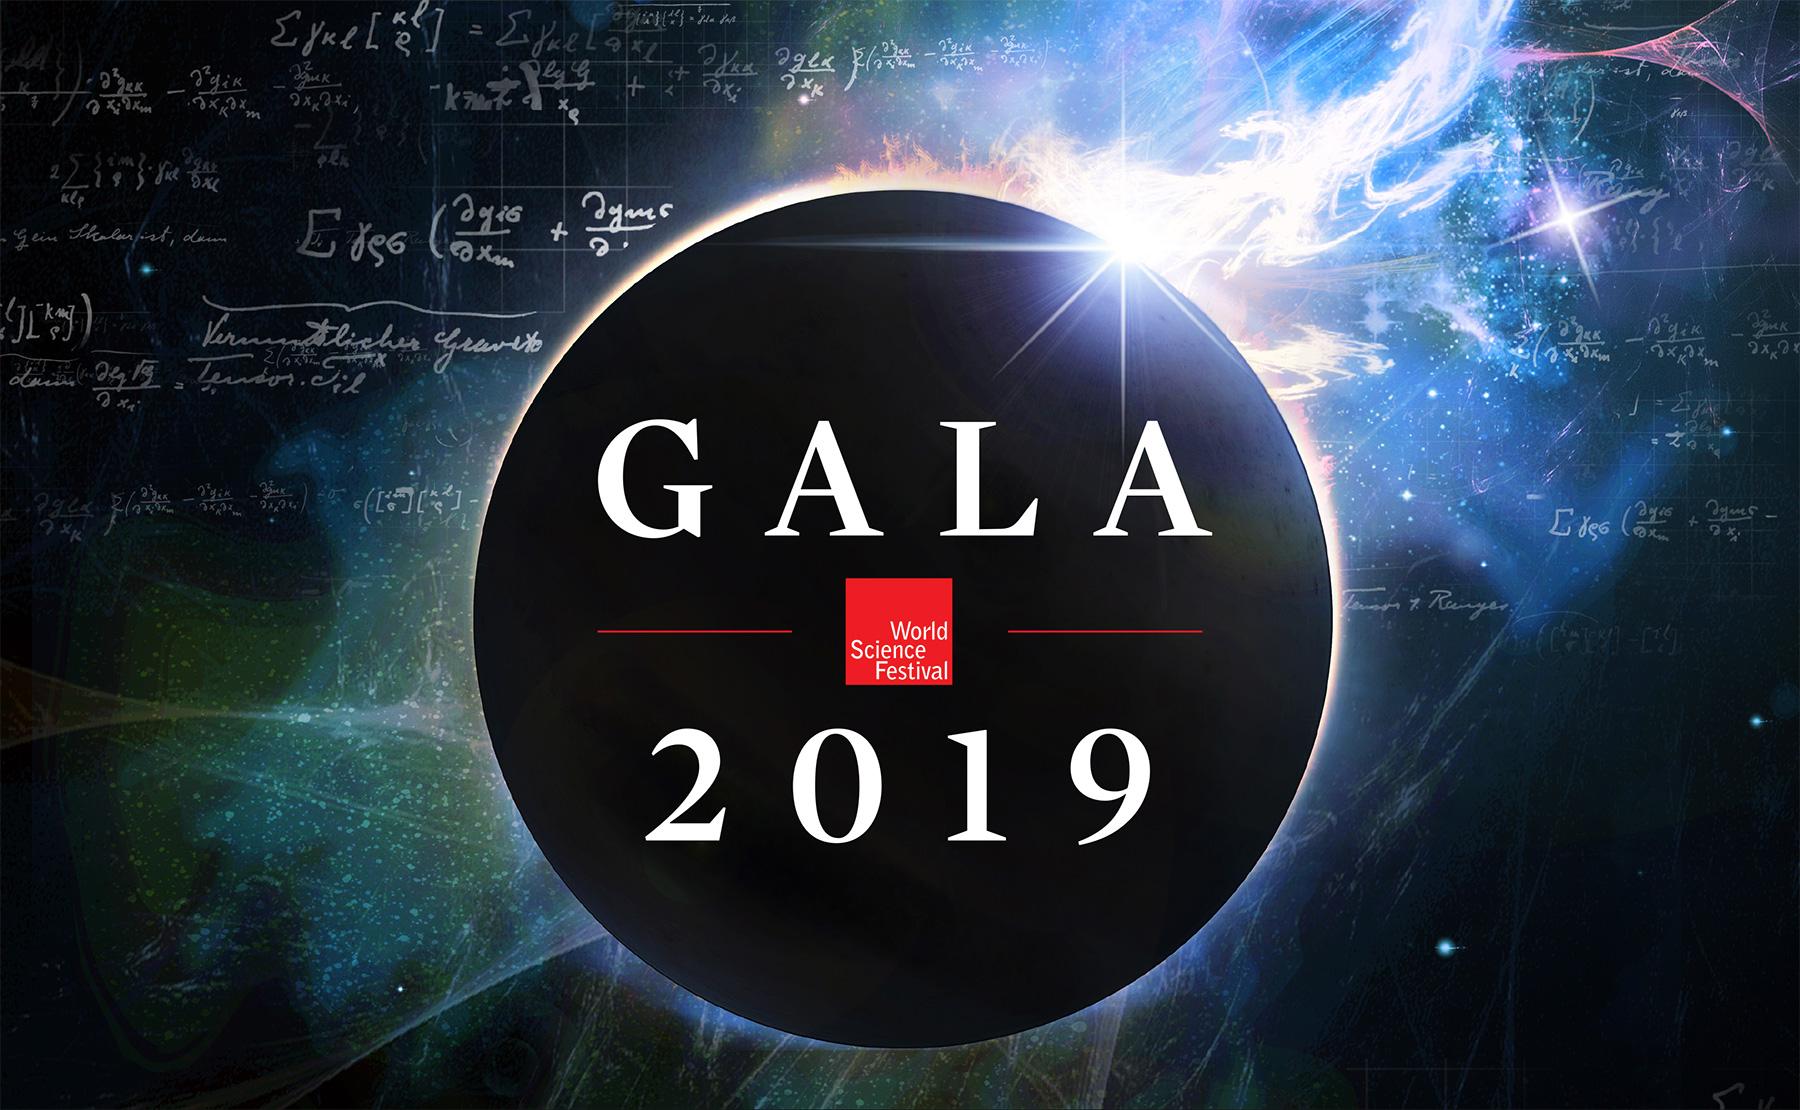 World Science Festival Gala 2019 | World Science Festival